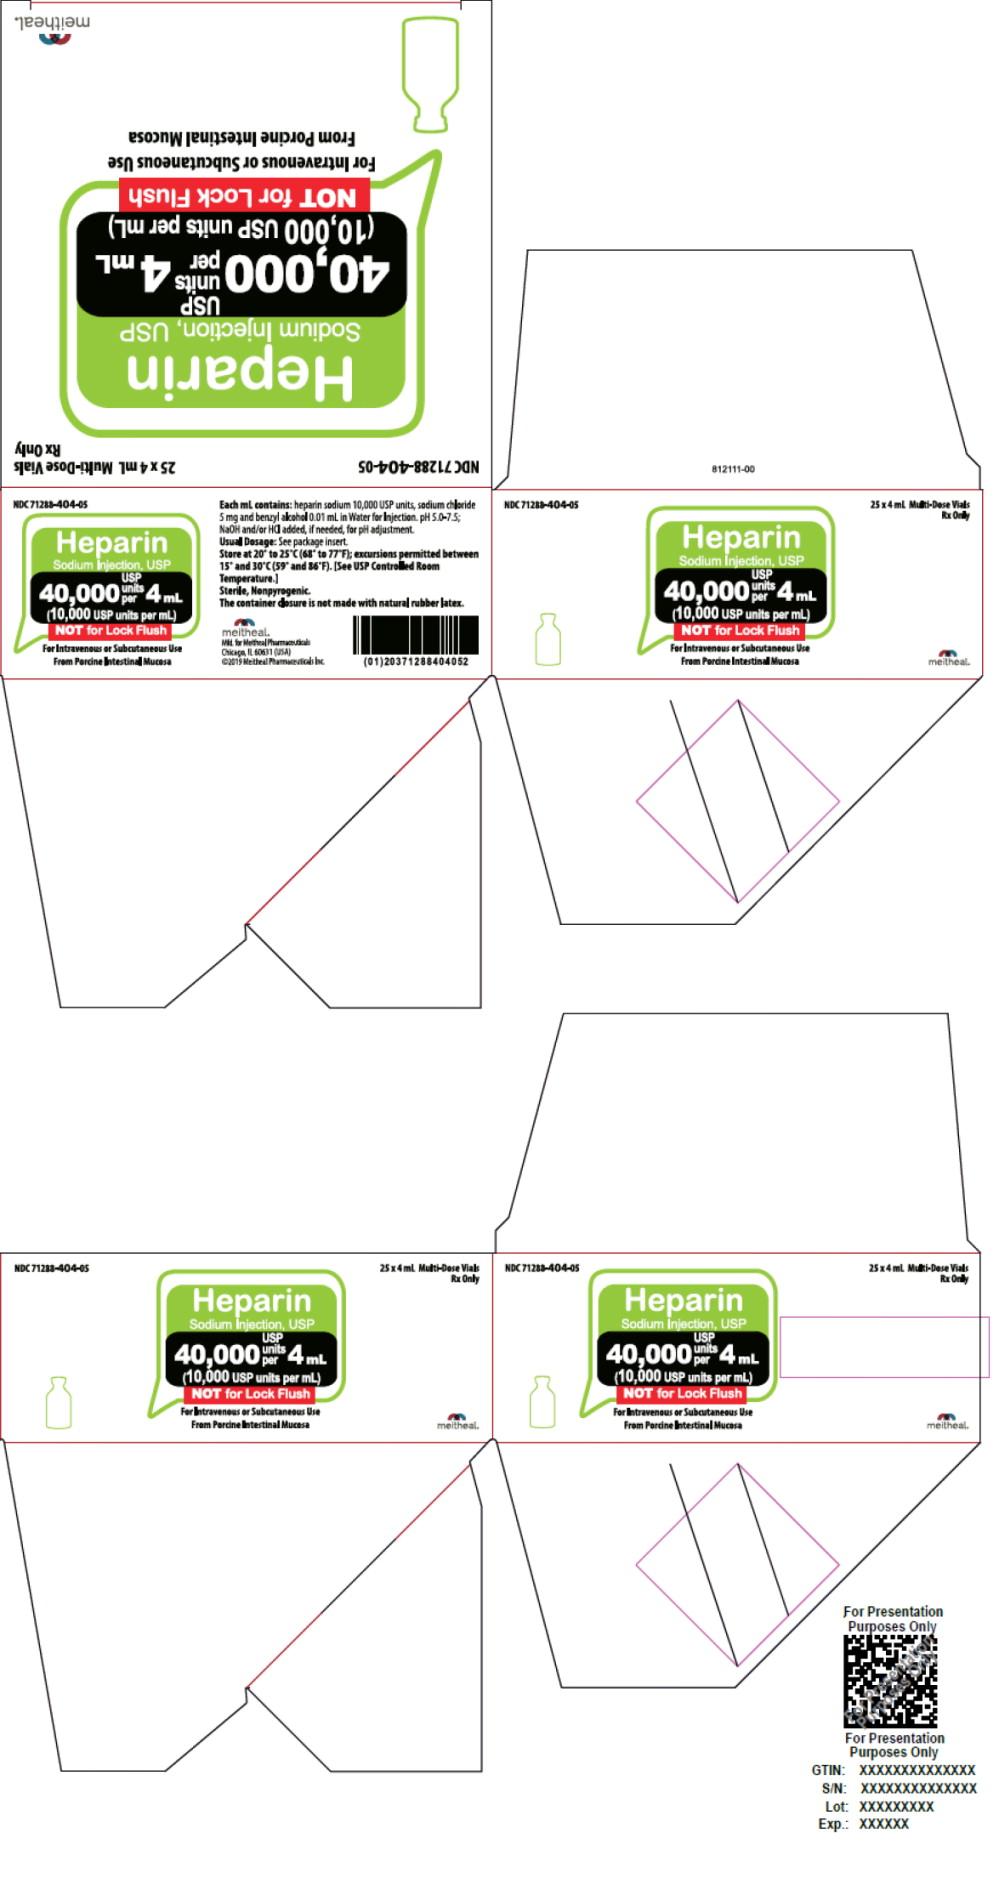 Principal Display Panel – Heparin Sodium Injection, USP 40,000 USP Carton